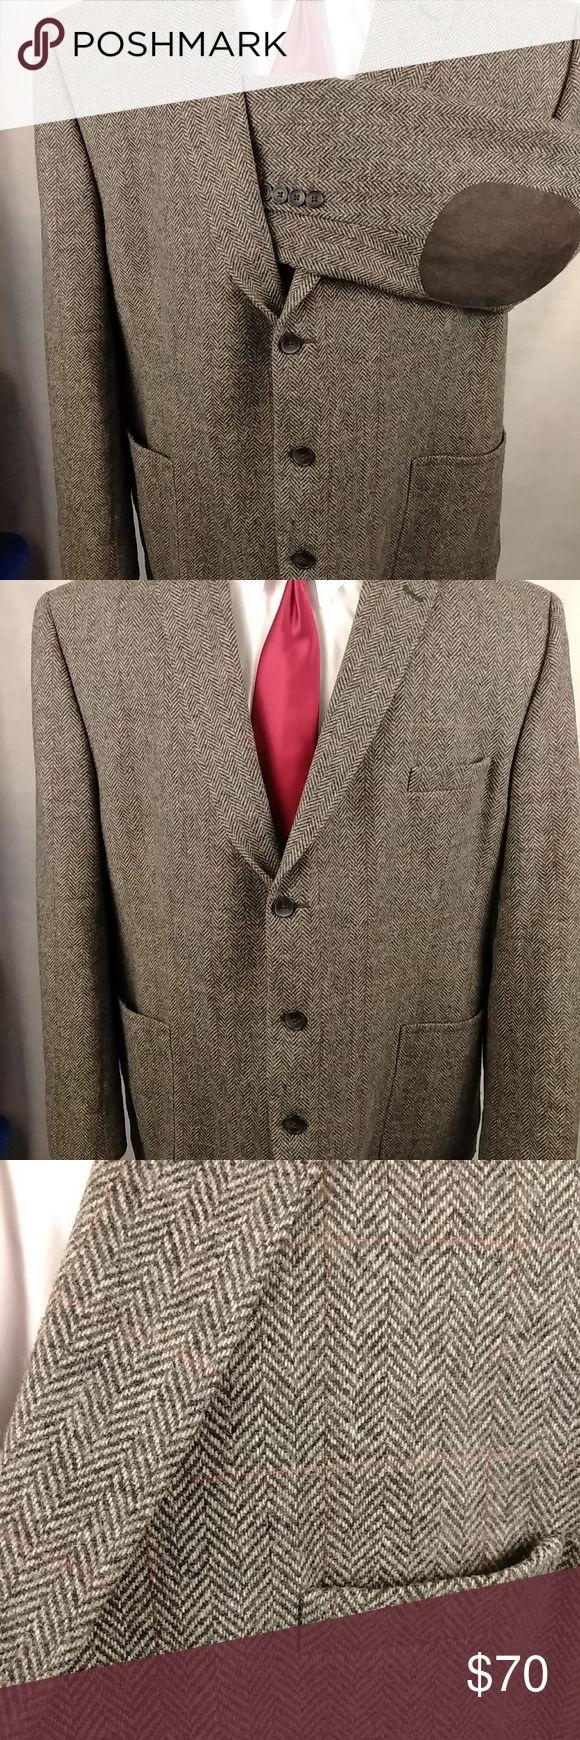 Joseph Abboud Tweed Sport Coat Elbow Patches · Condition